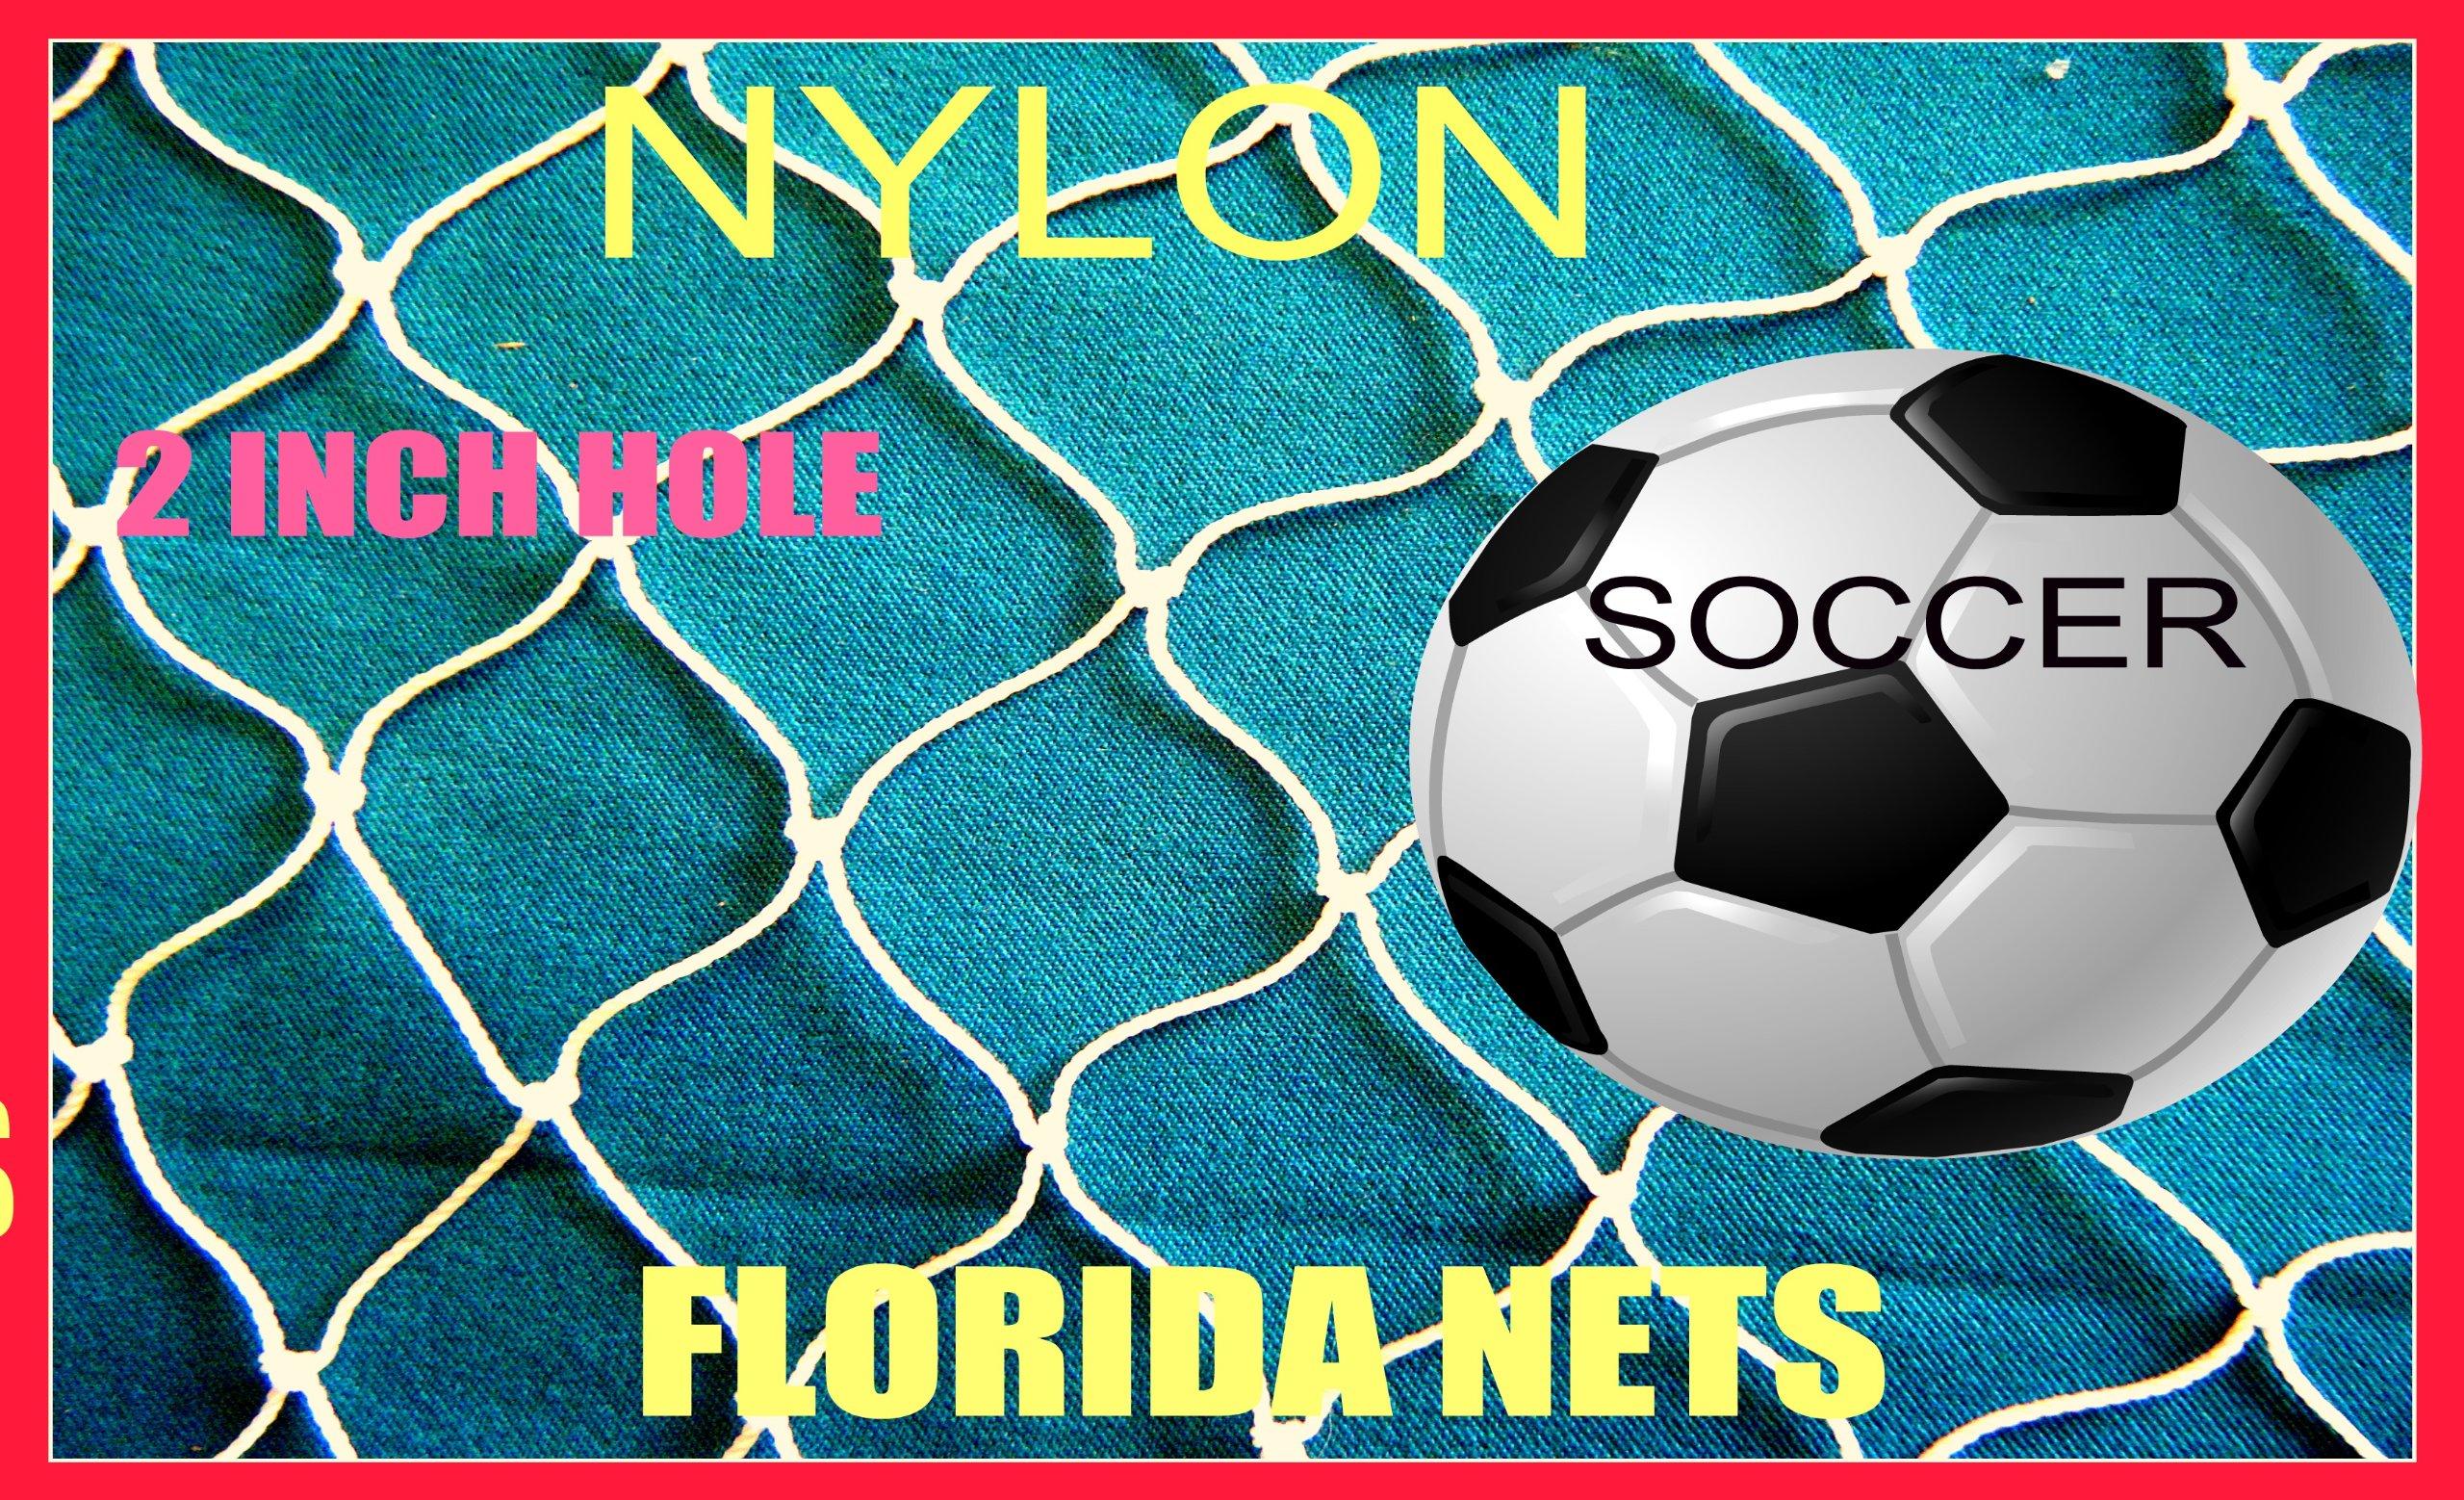 100' X 25' Soccer, Basketball, Softball, Sports, Fishing Net, Netting, Cage, Disc Golf,